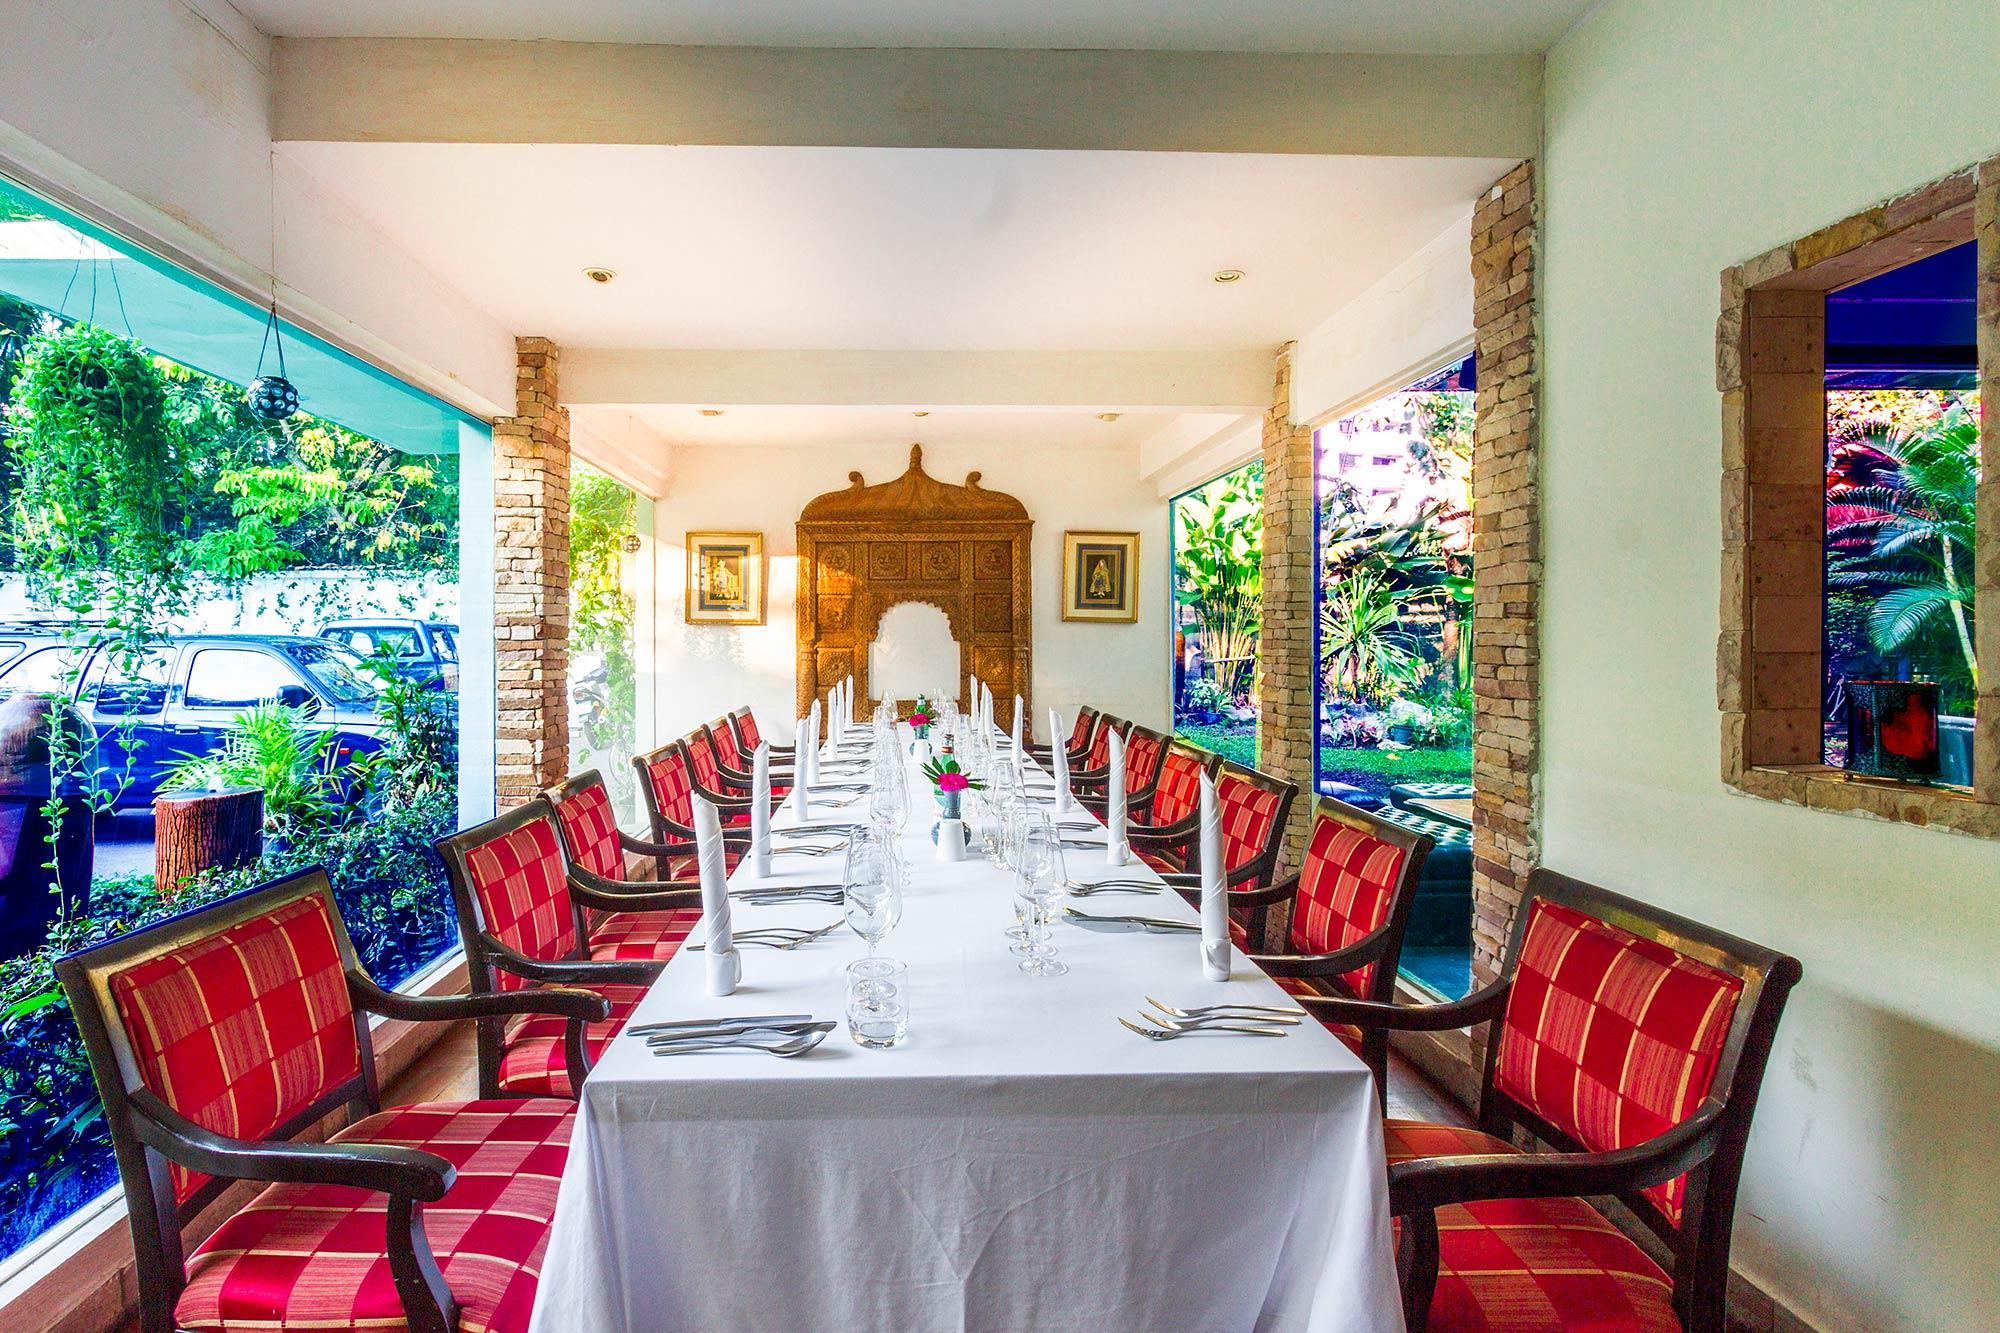 indus อินดัส ร้านอาหารอินเดีย สุขุมวิท 26  indus อินดัส ร้านอาหารอินเดีย สุขุมวิท 26 IMG 3524 01